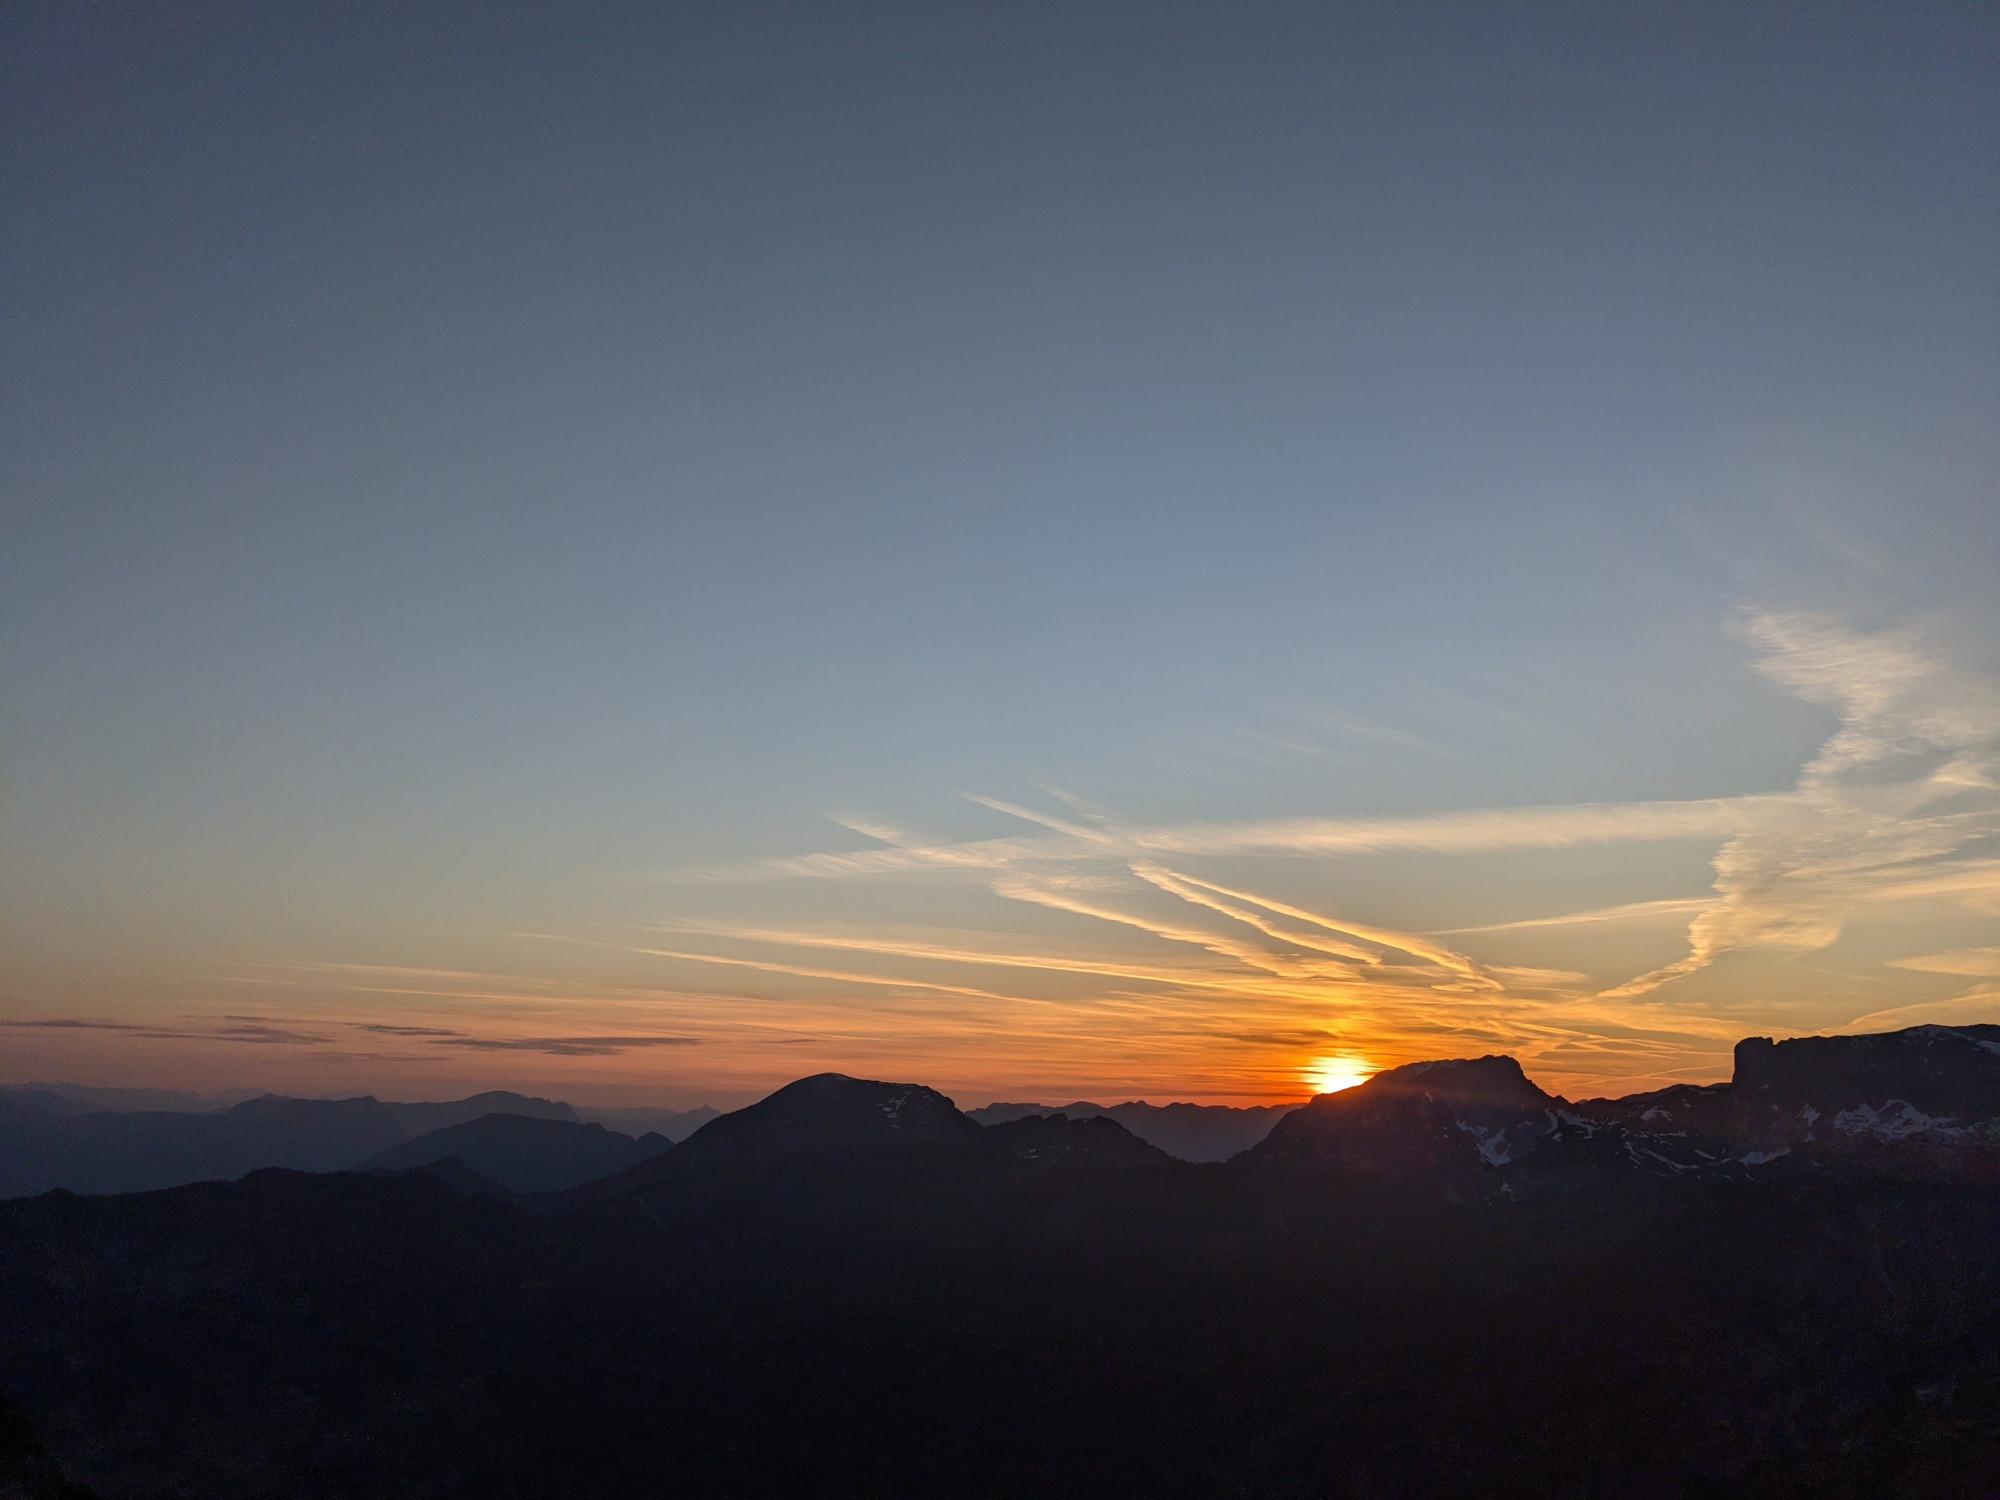 2021-06-16 Sunset